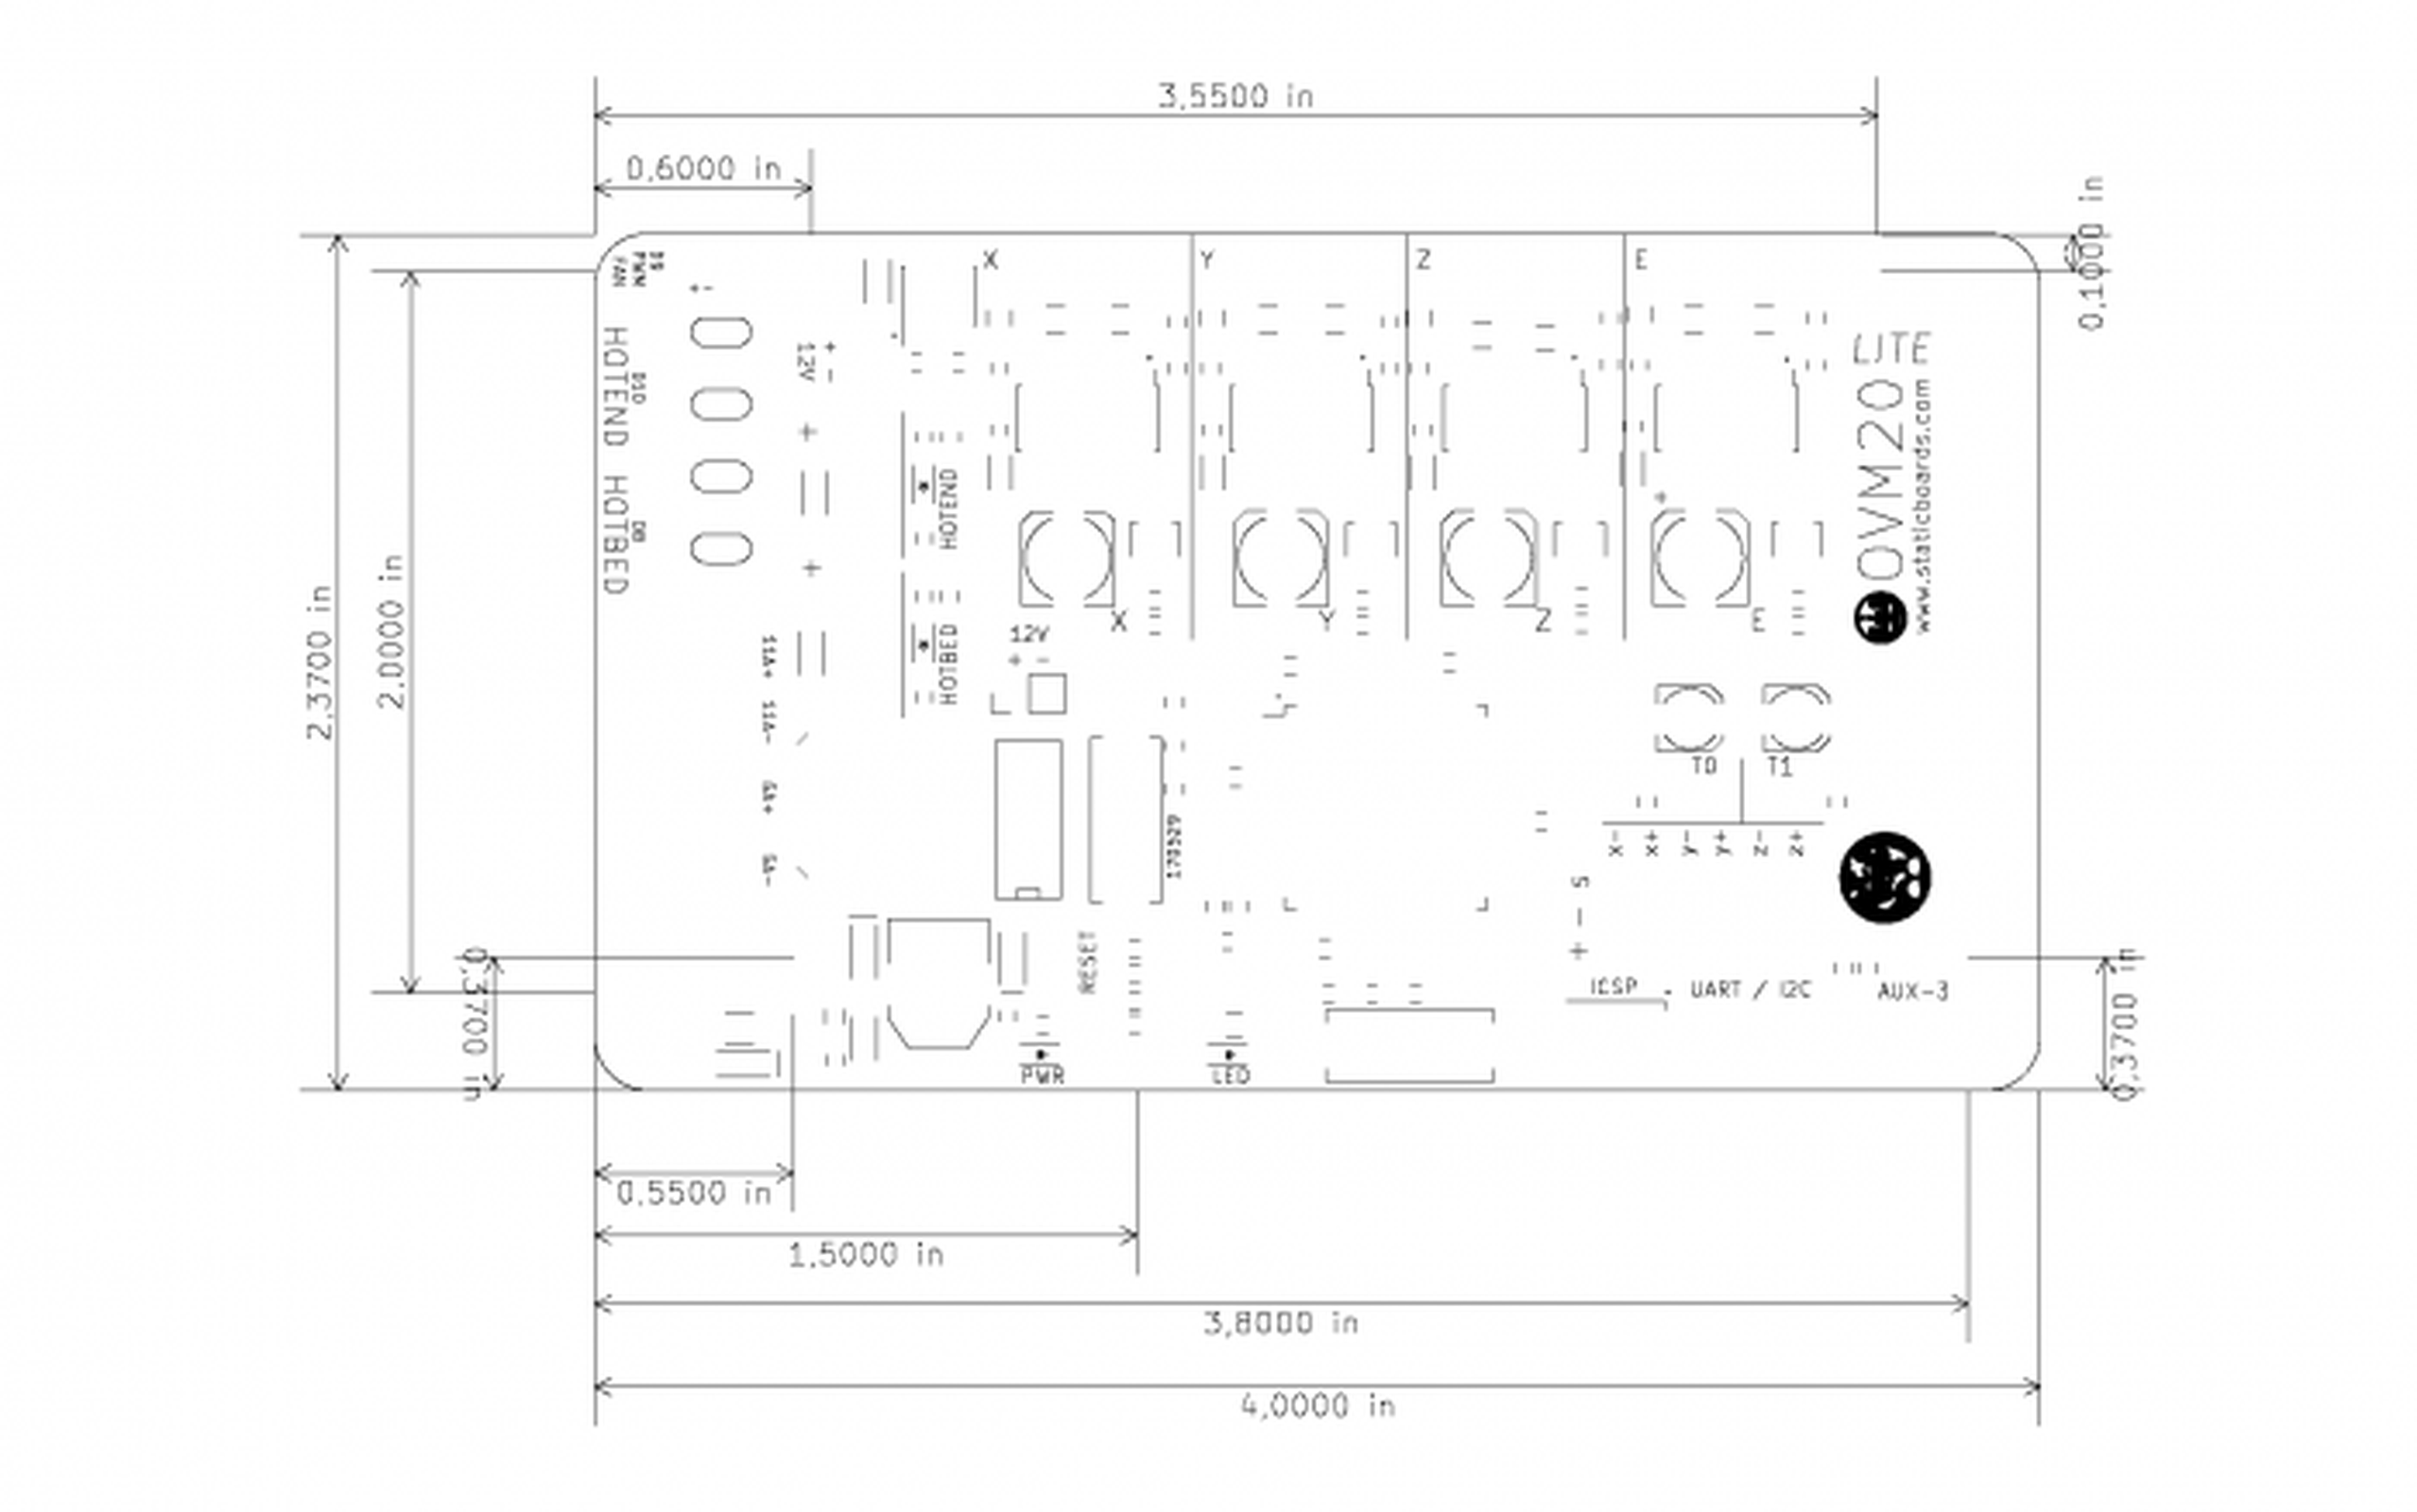 ... Ramps Wiring Diagram Fan V1 4 Predator 212 Engine Diagram Wire